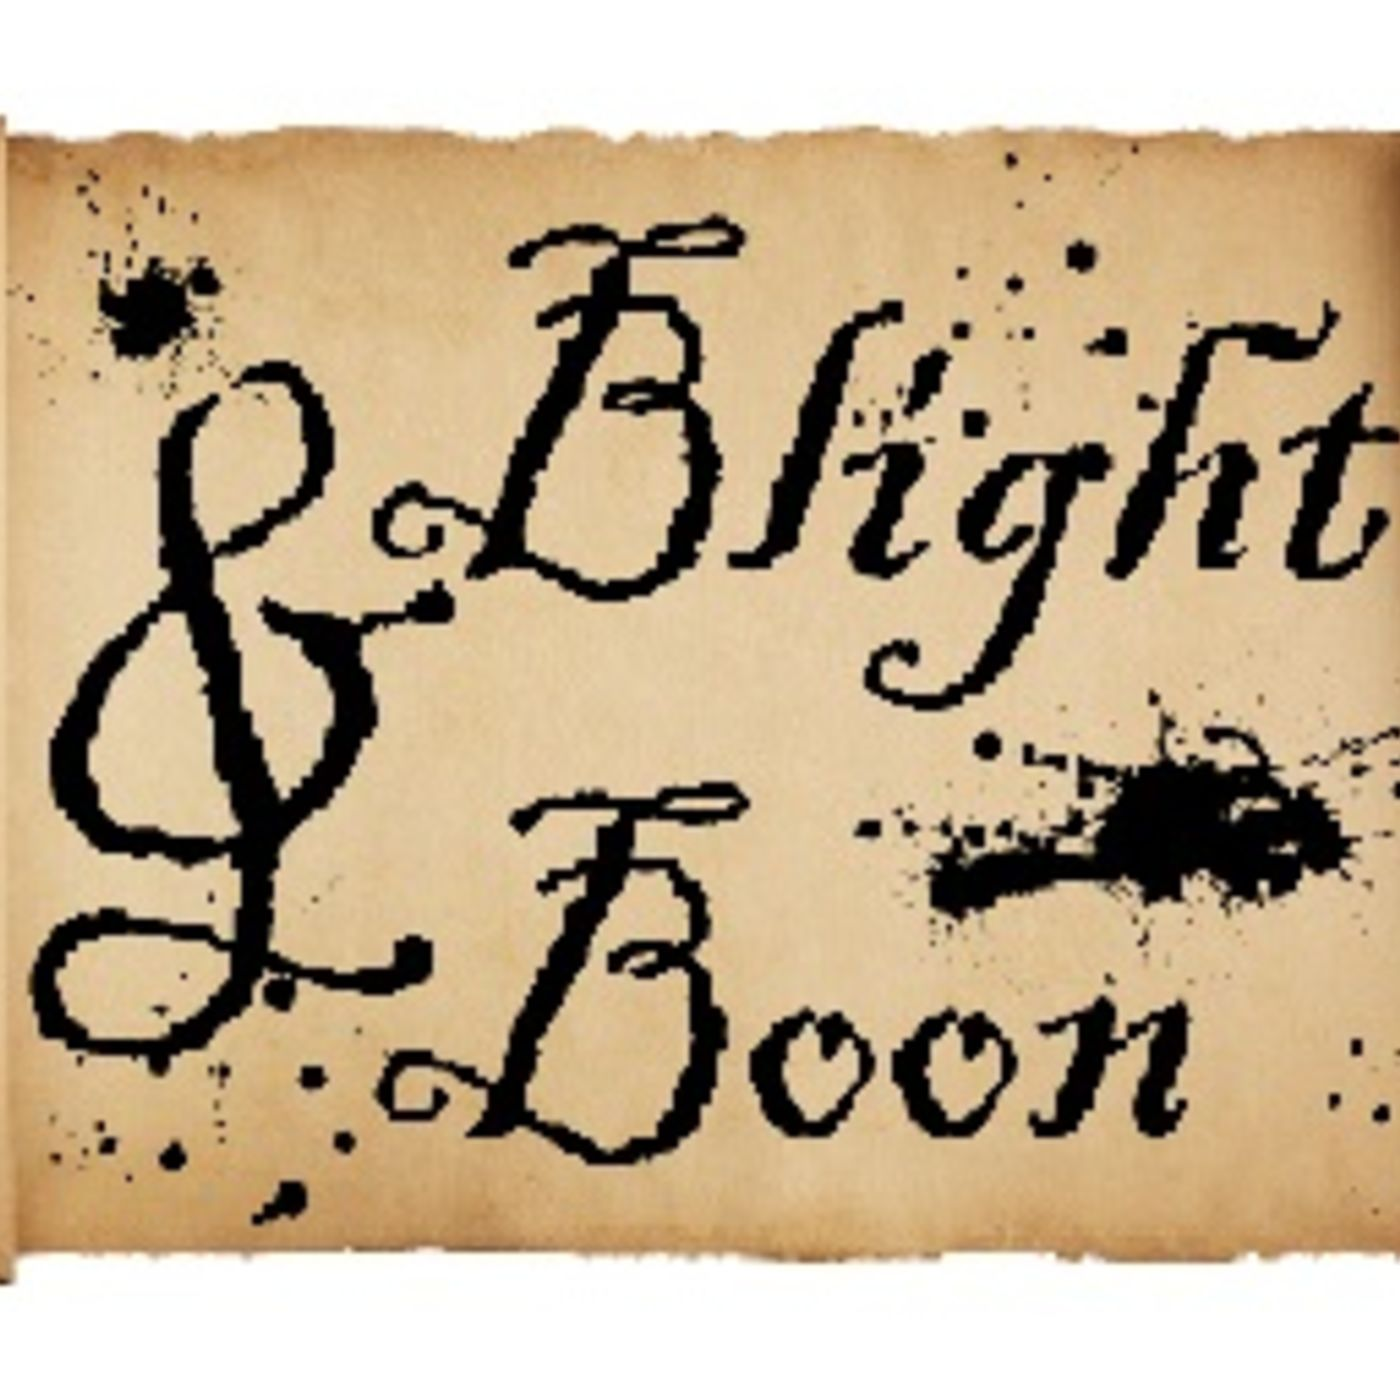 Blight and Boon - A Godtear Podcast - Episode 12 - Scenario Focus - Life